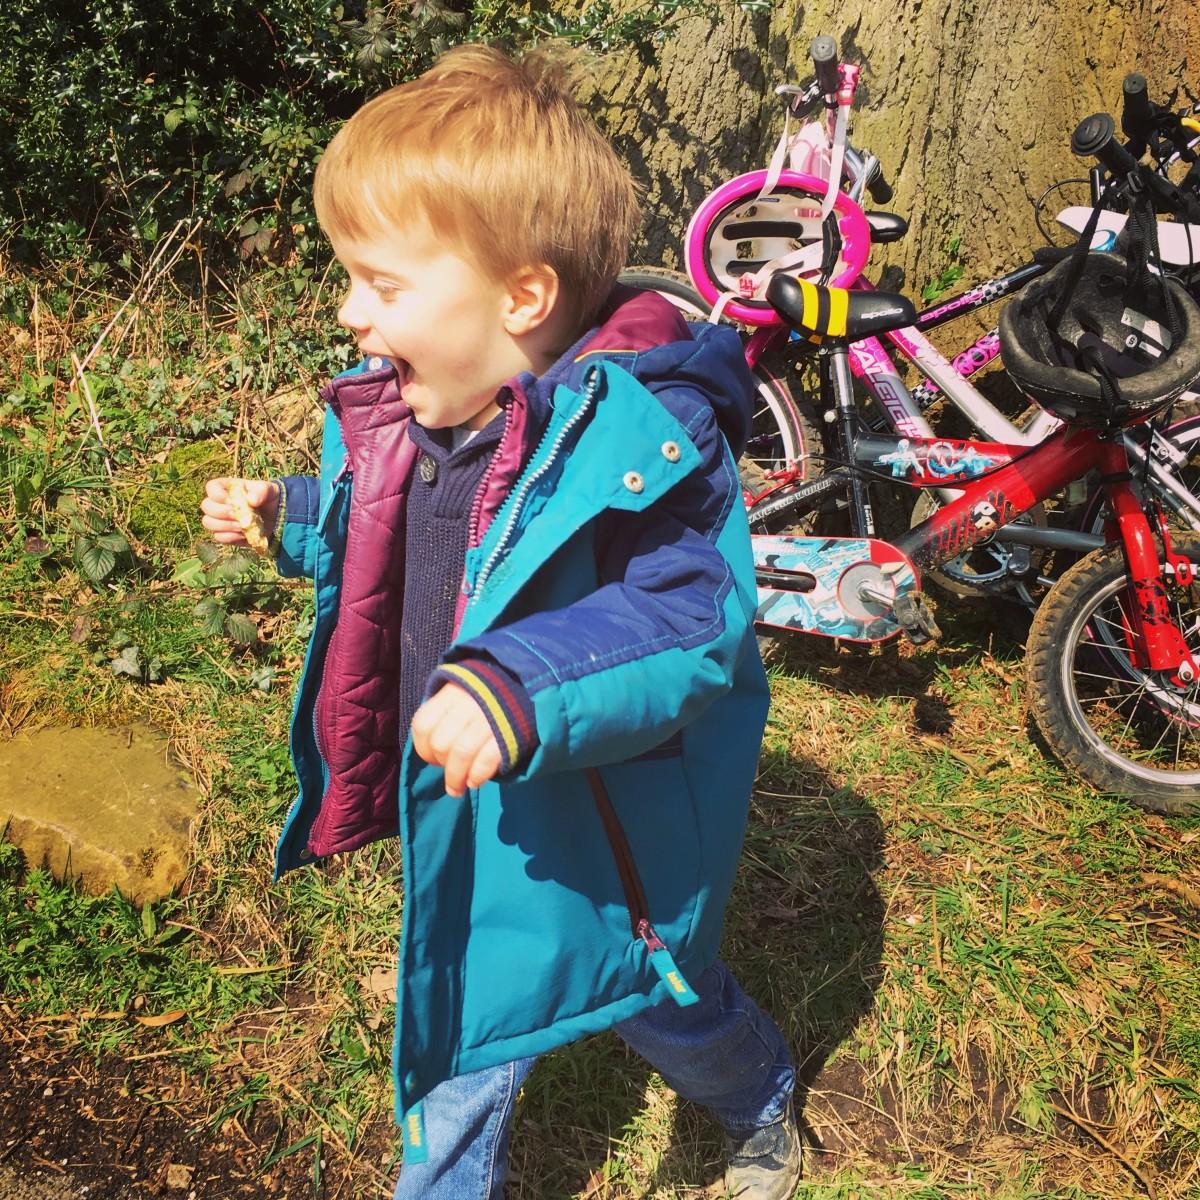 Harrogate Mama, Harrogate mums, Ripley Bike ride, Ripley, kids bike ride Harrogate, IMG_8745